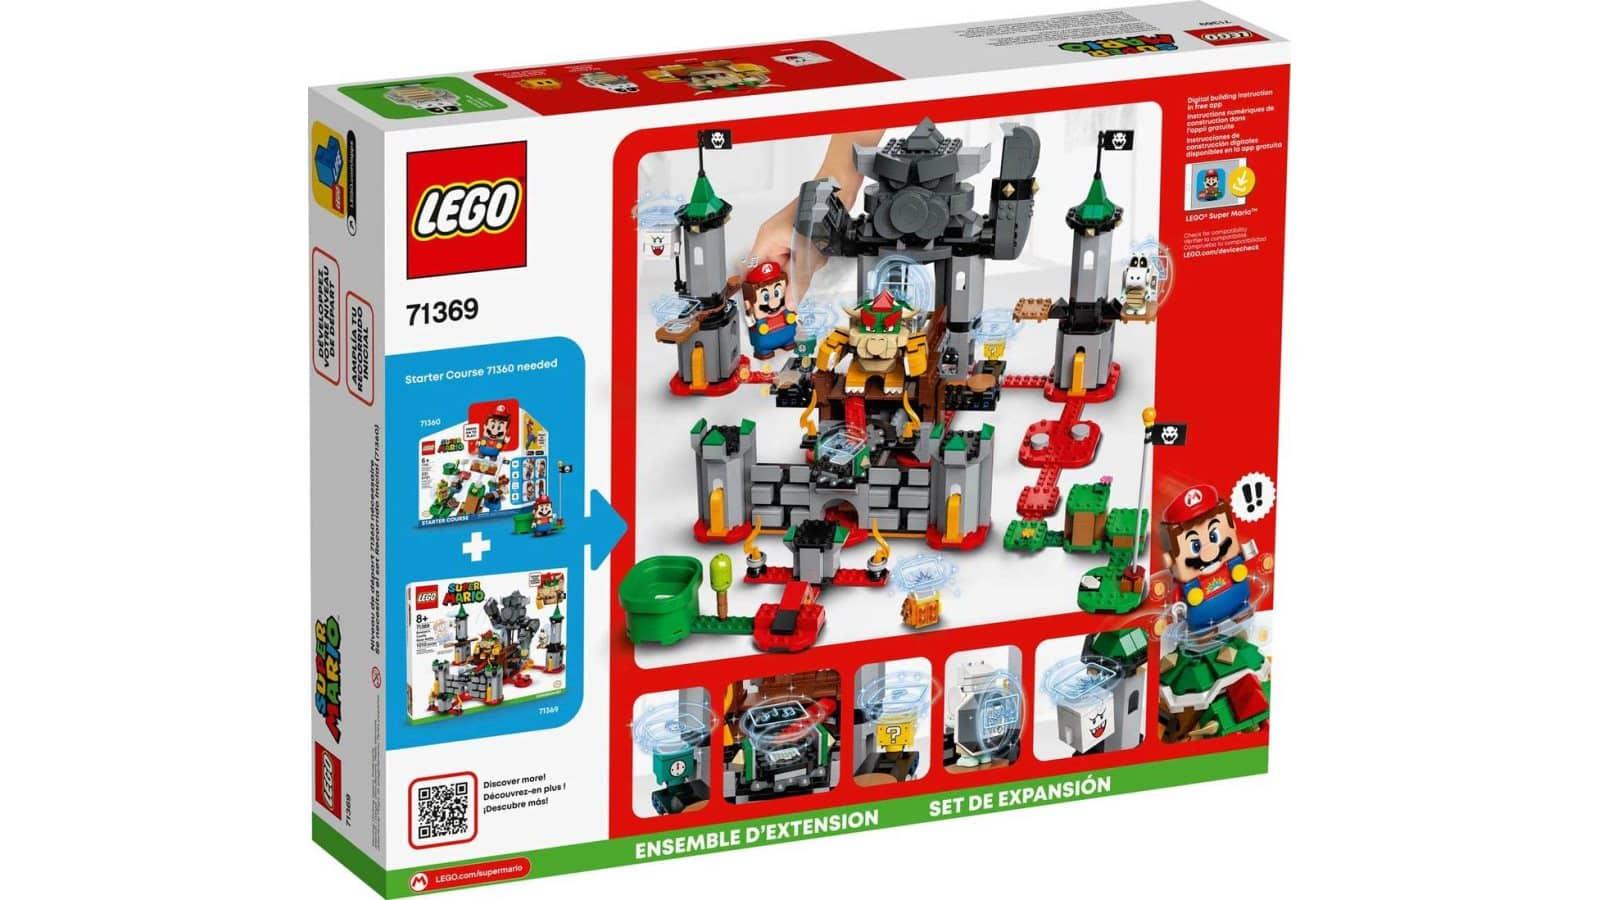 LEGO 71369 Bowser's Castle Boss Battle Expansion Set - אריזה אחורית